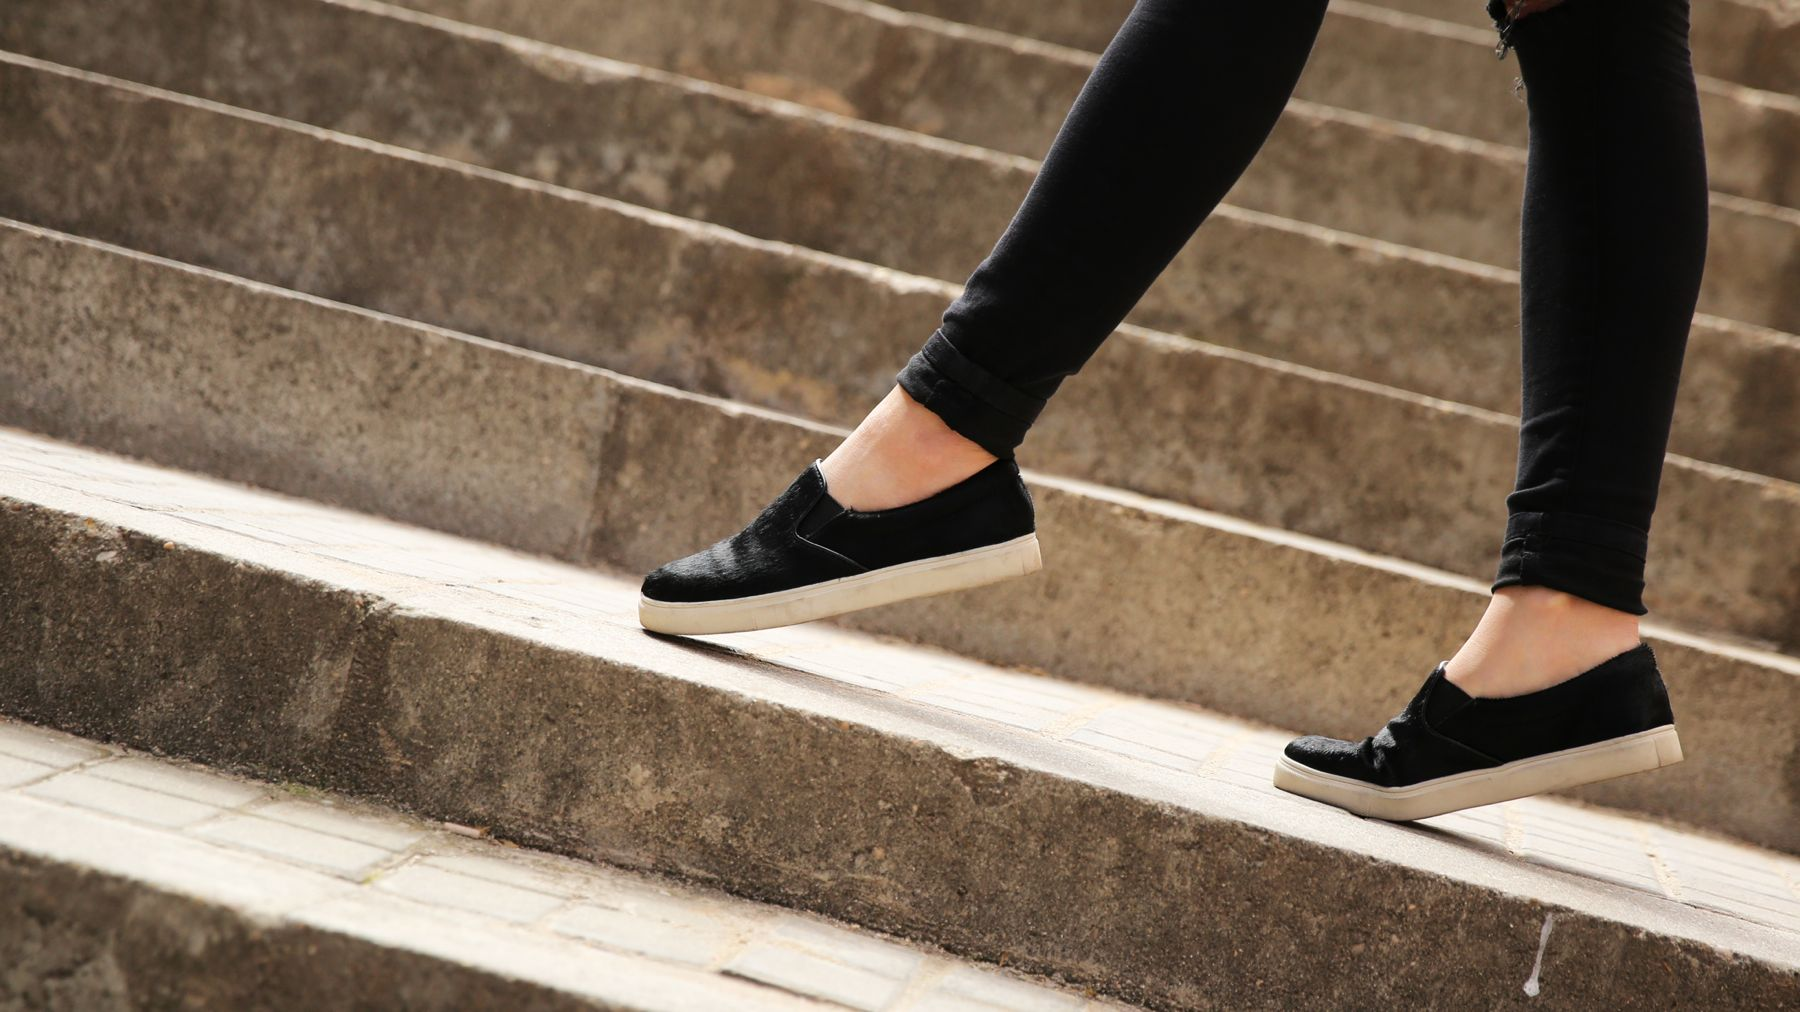 trendy_taste-look-outfit-street_style-ootd-blog-blogger-fashion-spain-moda-españa-steve-madden-plaid-shirt-camisa-cuadros-skinny-jeans-pitillos-negros-9